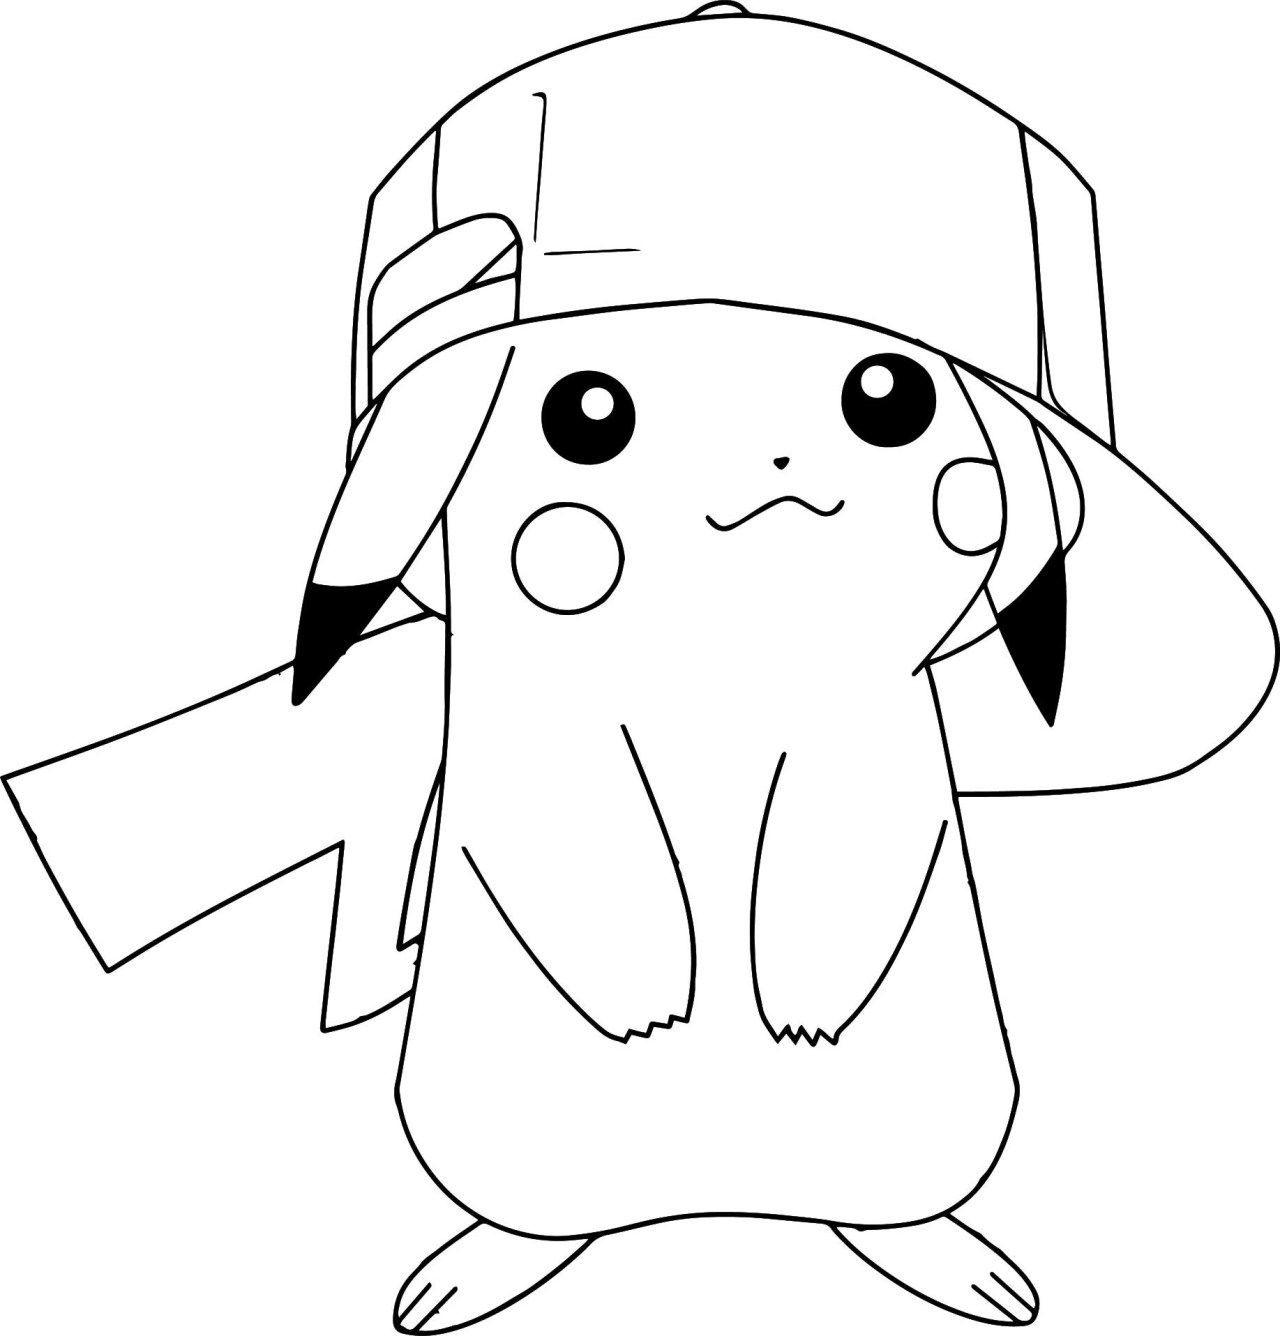 Free Printable Pokemon Coloring Pages Pokemon Coloring Pages Printable Free Printable Pokemon Coloring Entitlementtrap Com Pikachu Coloring Page Cartoon Coloring Pages Pokemon Coloring Pages